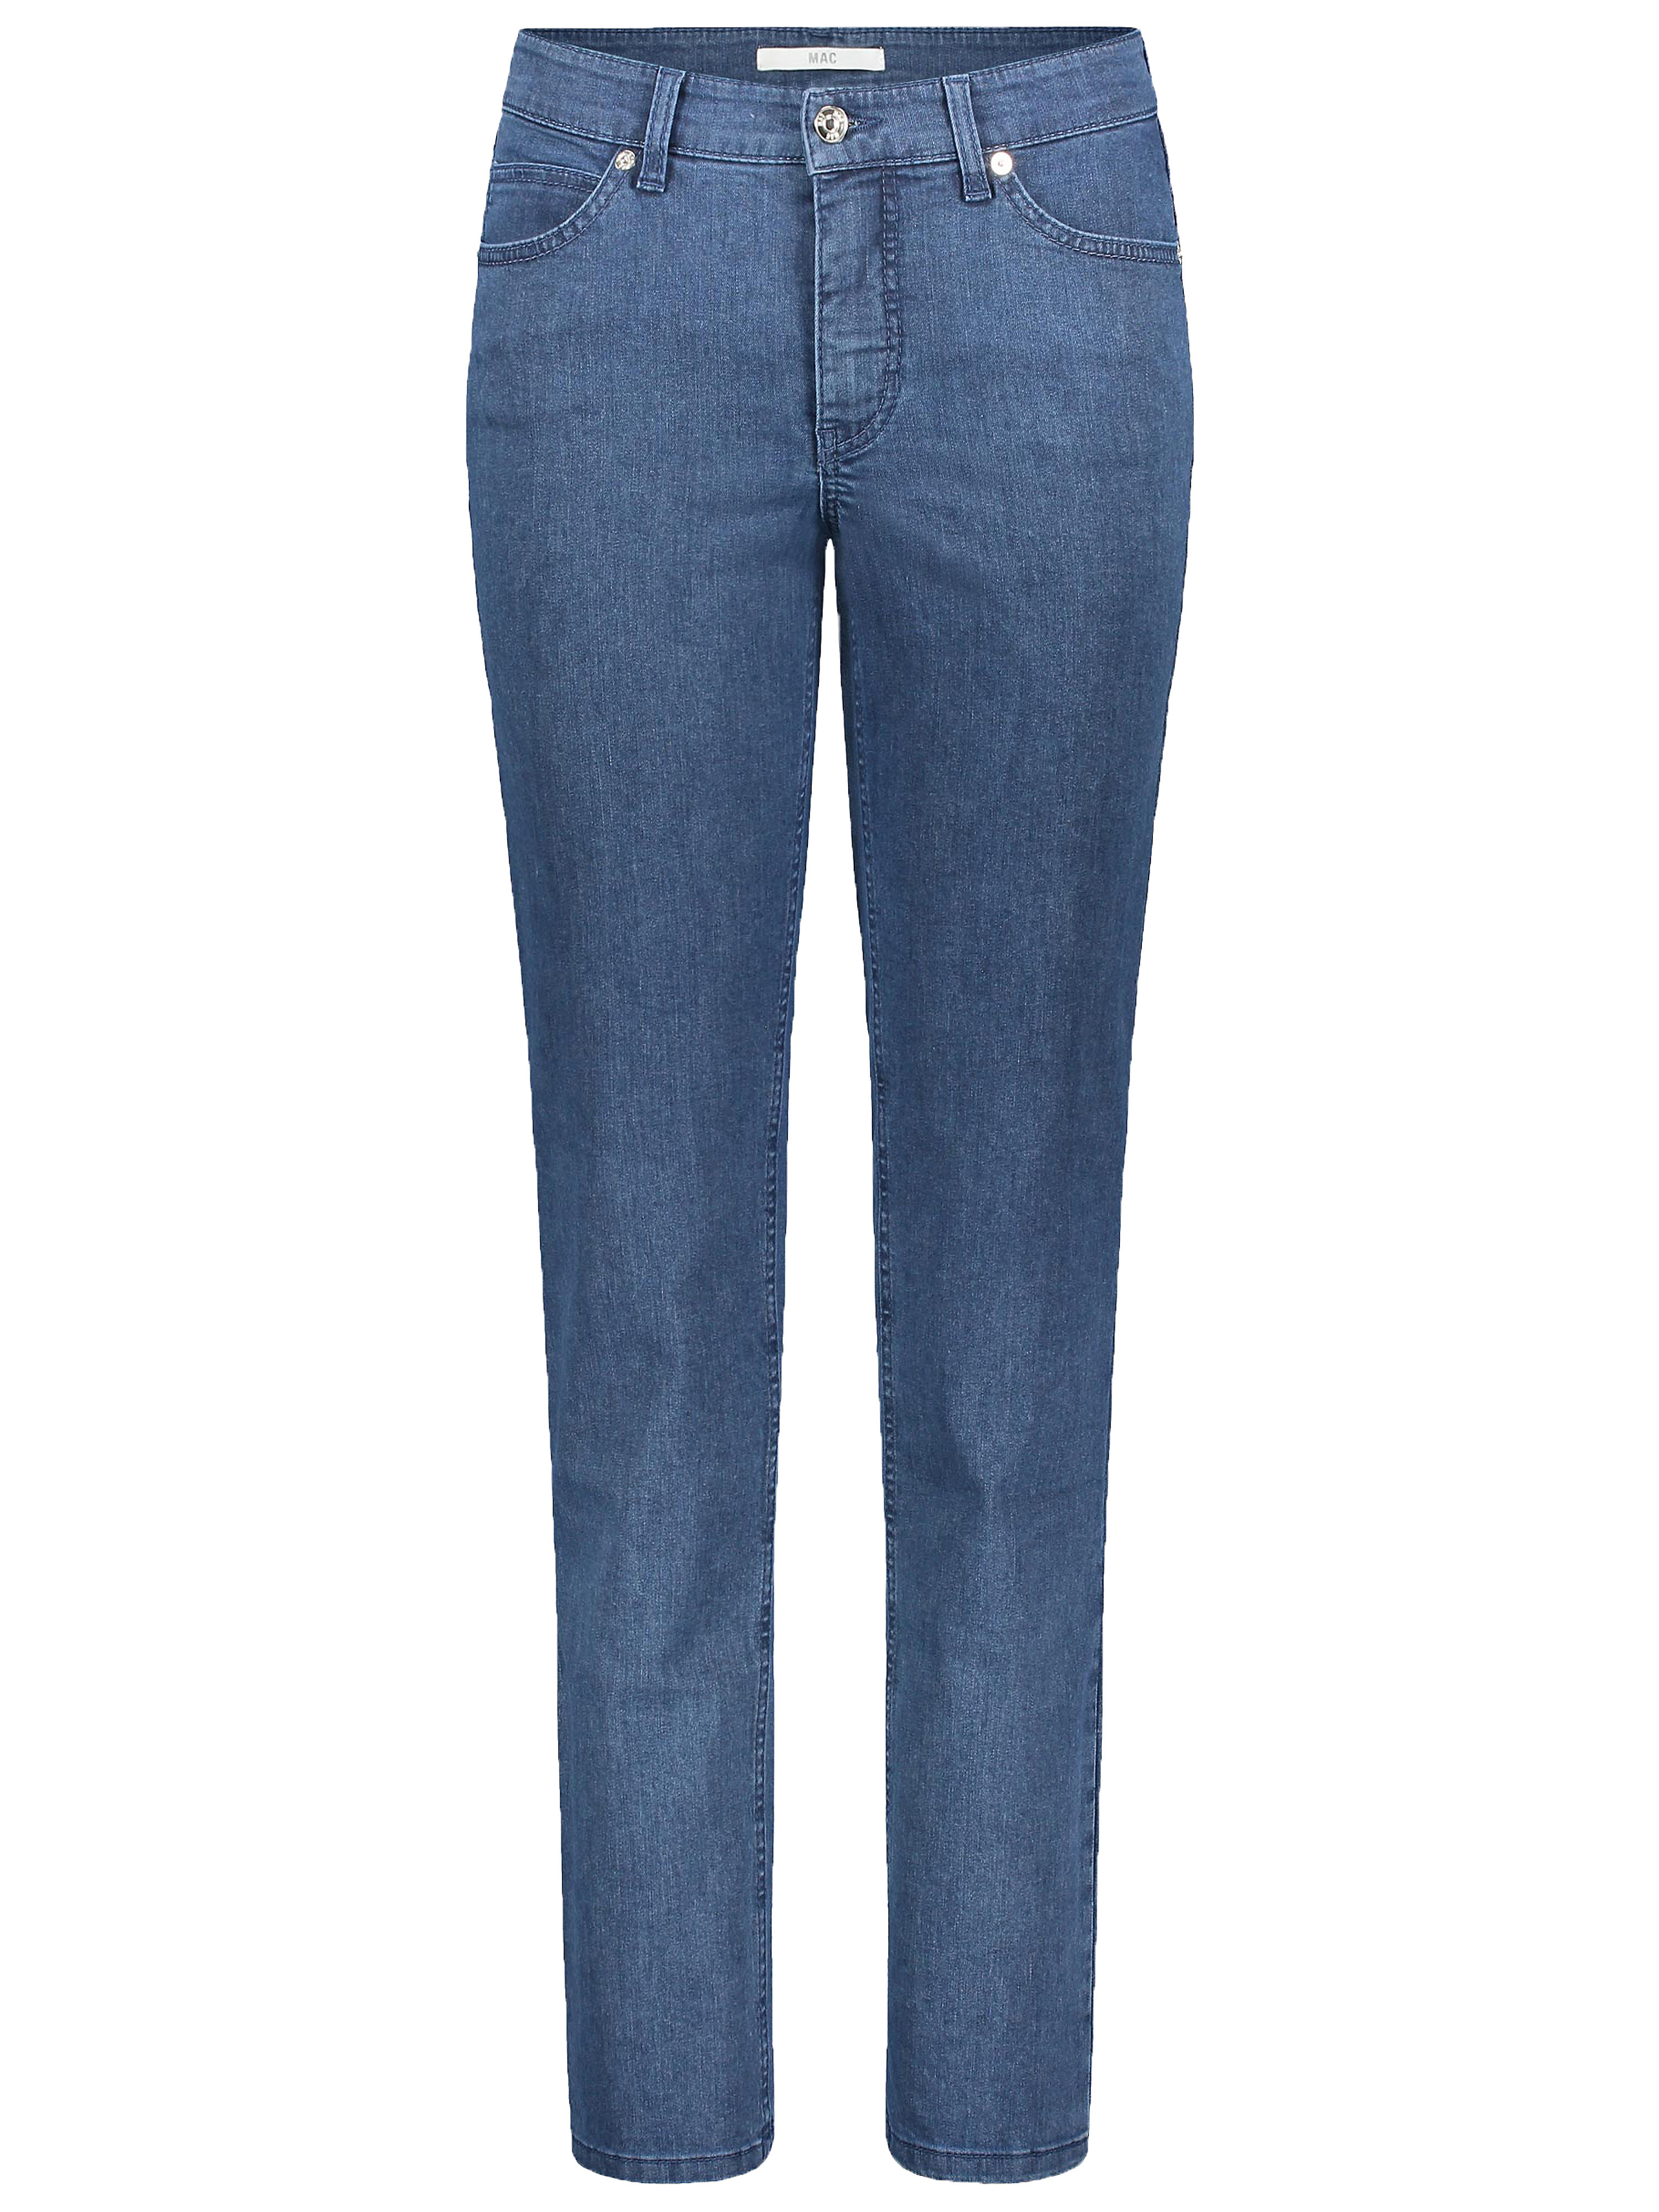 Image of   'Feminine Fit'-jeans Inch 32 Fra Mac denim